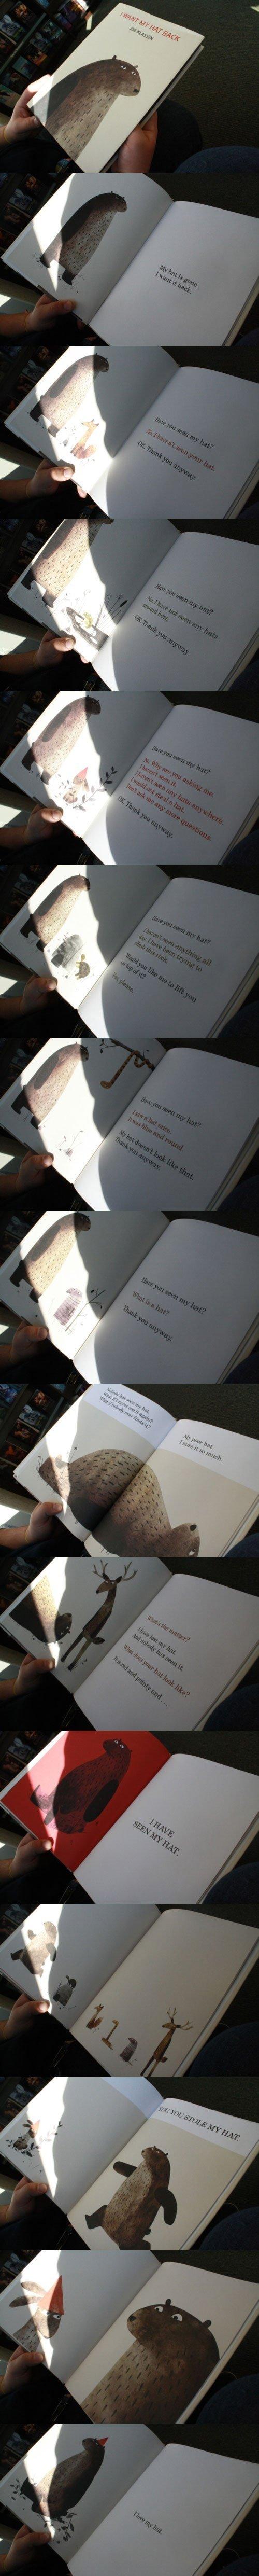 Good book,bro. . best kids book ever